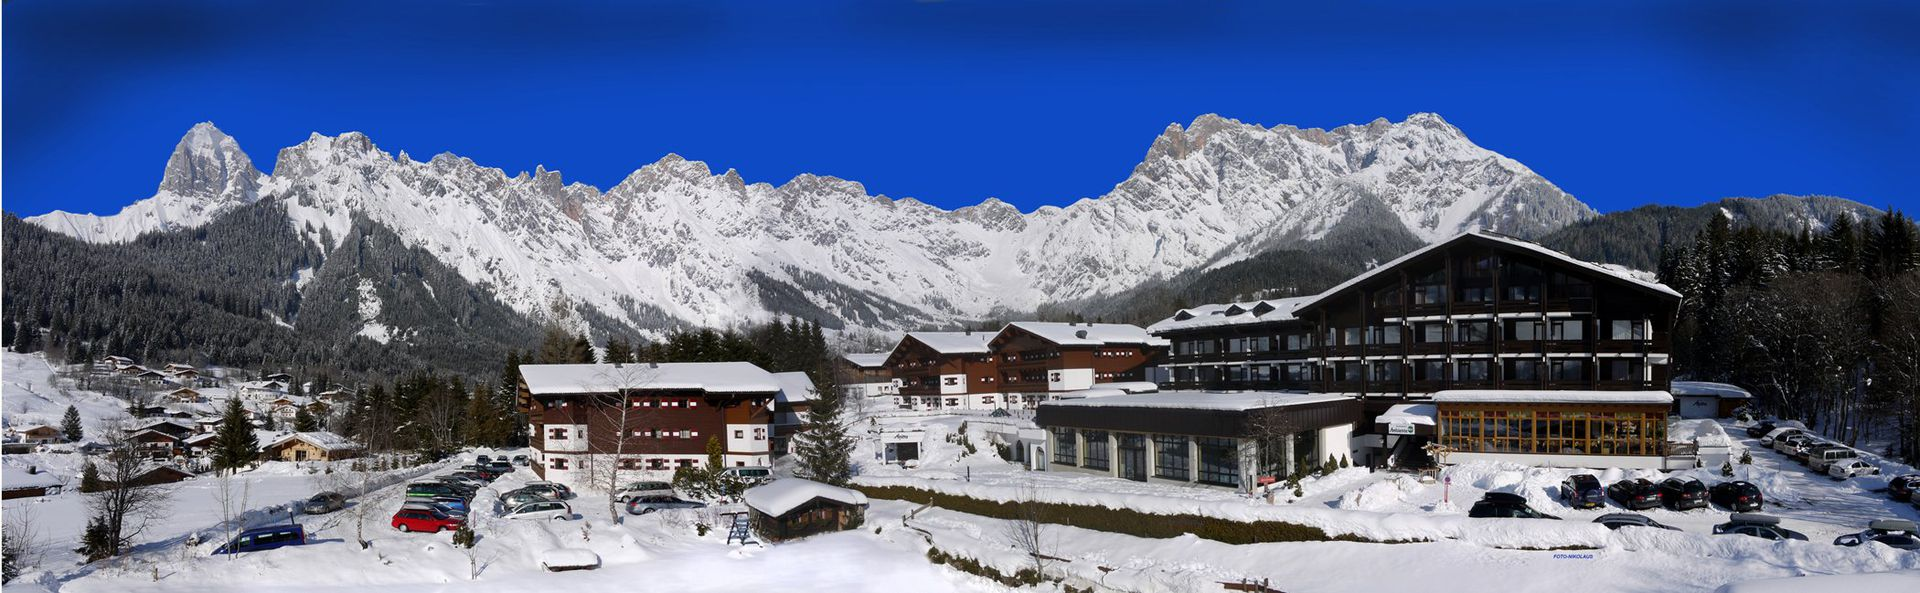 Slide1 - Sporthotel Marco Polo Alpina